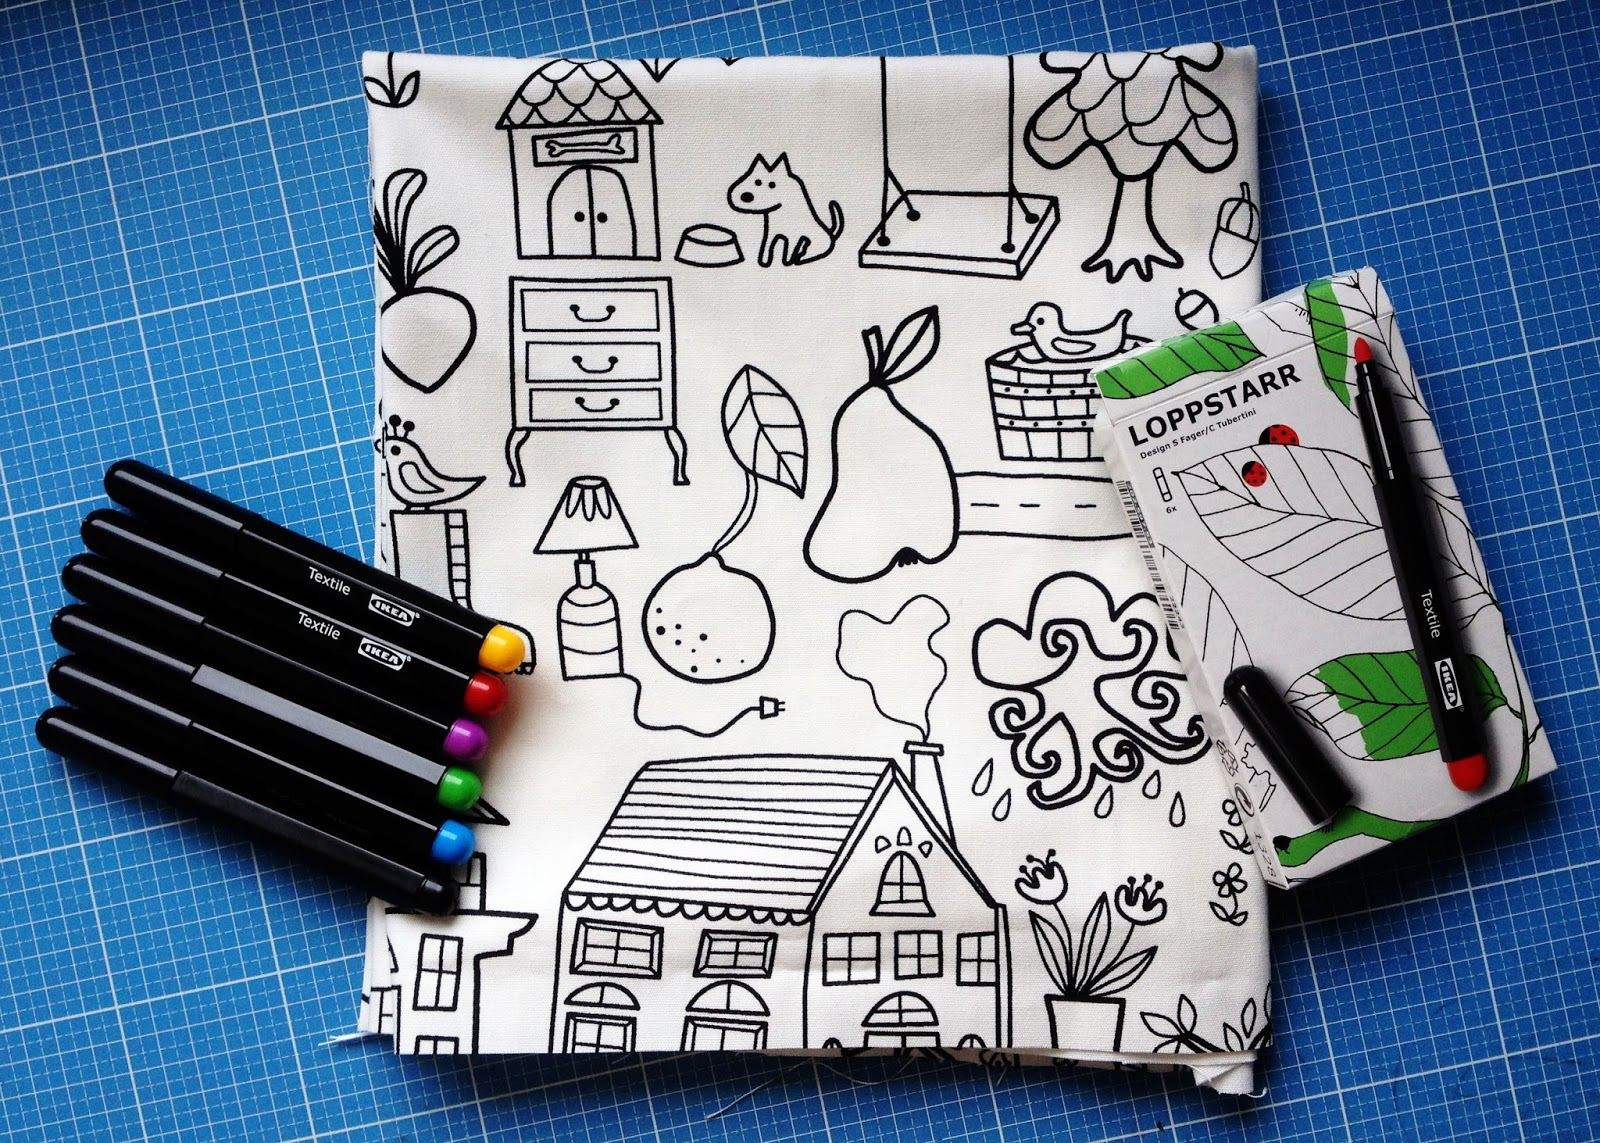 ikea kissen zum bemalen wohn design. Black Bedroom Furniture Sets. Home Design Ideas